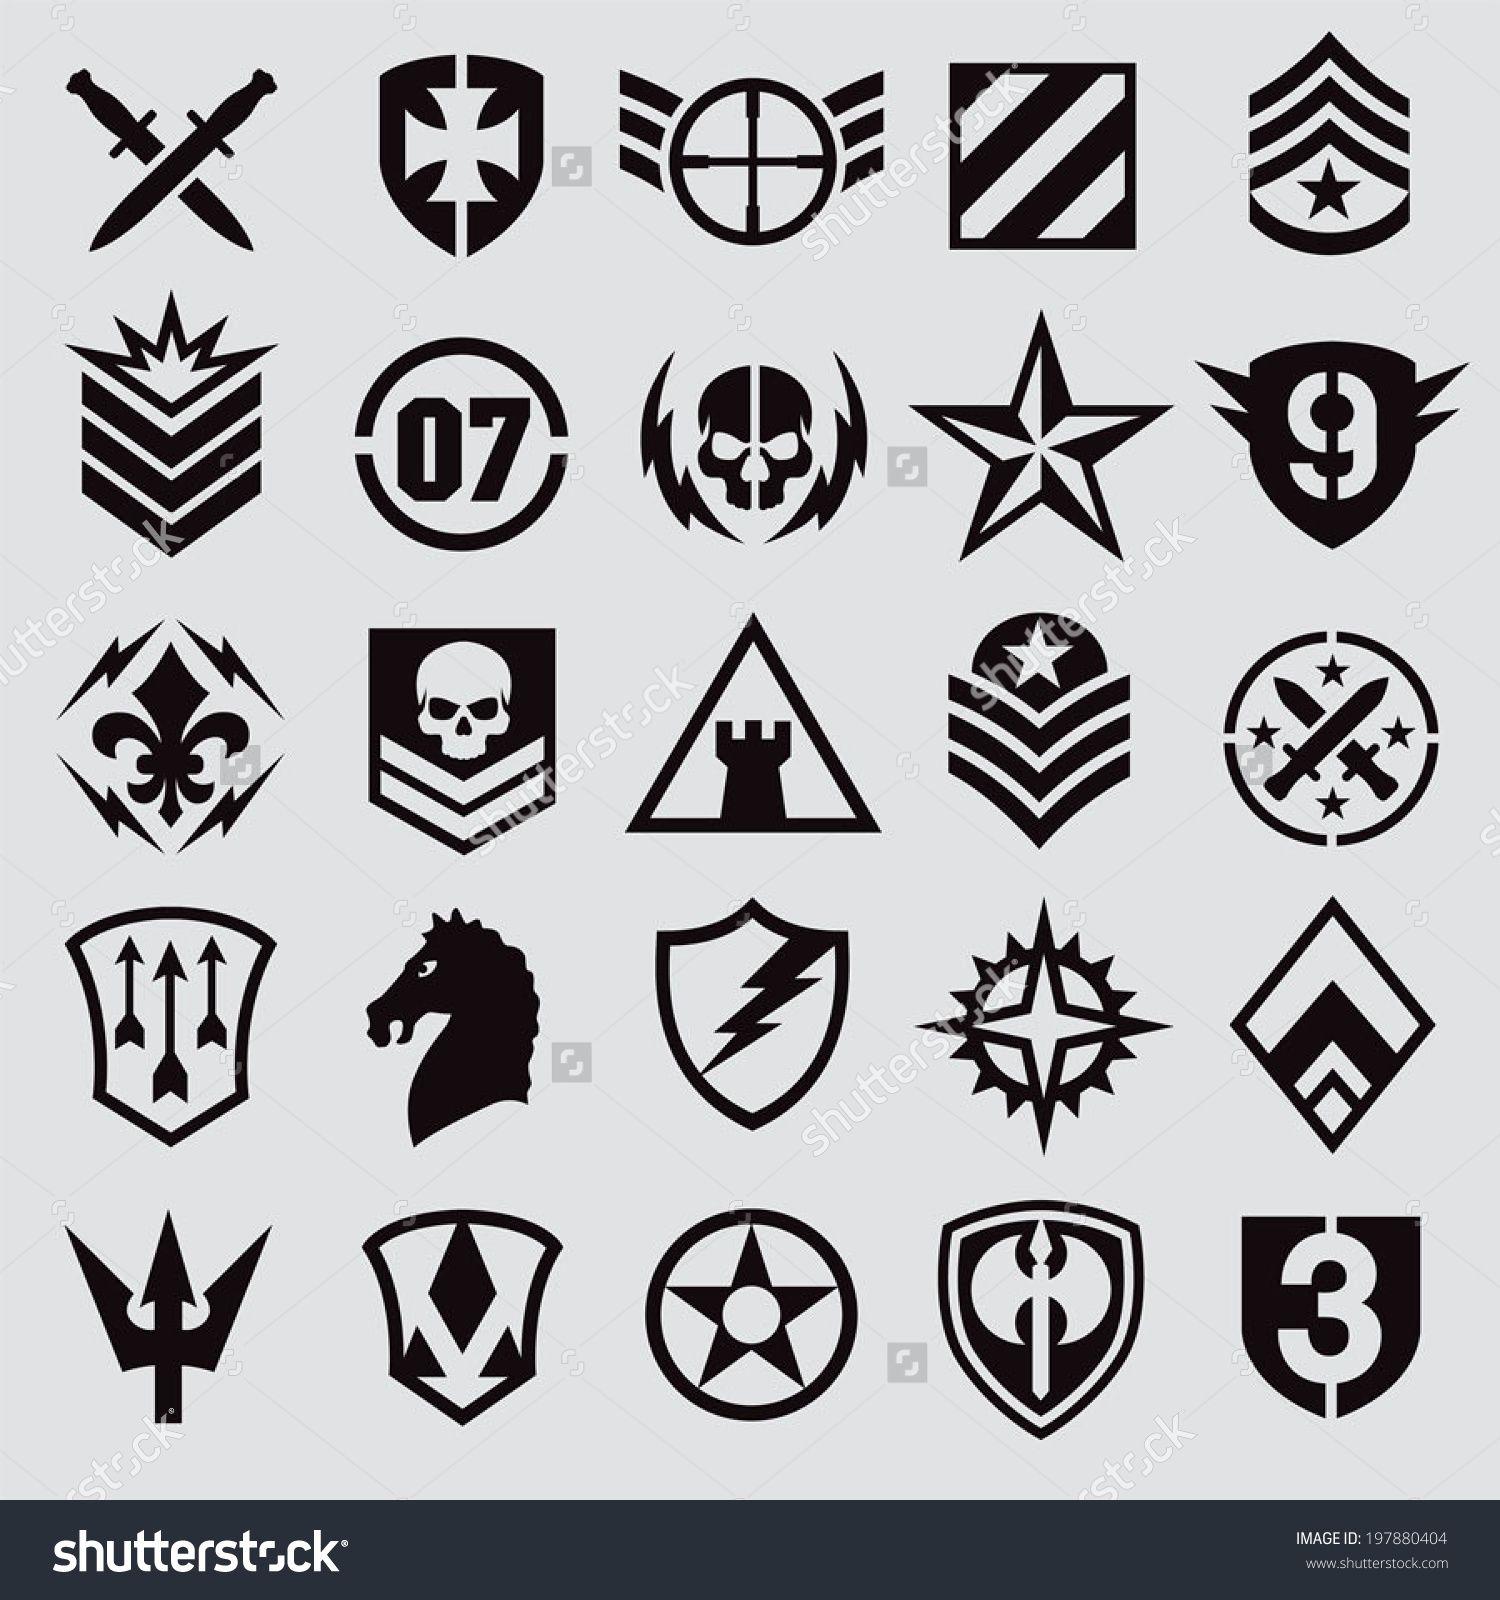 Military Badges Google Search Symbols Military Pinterest